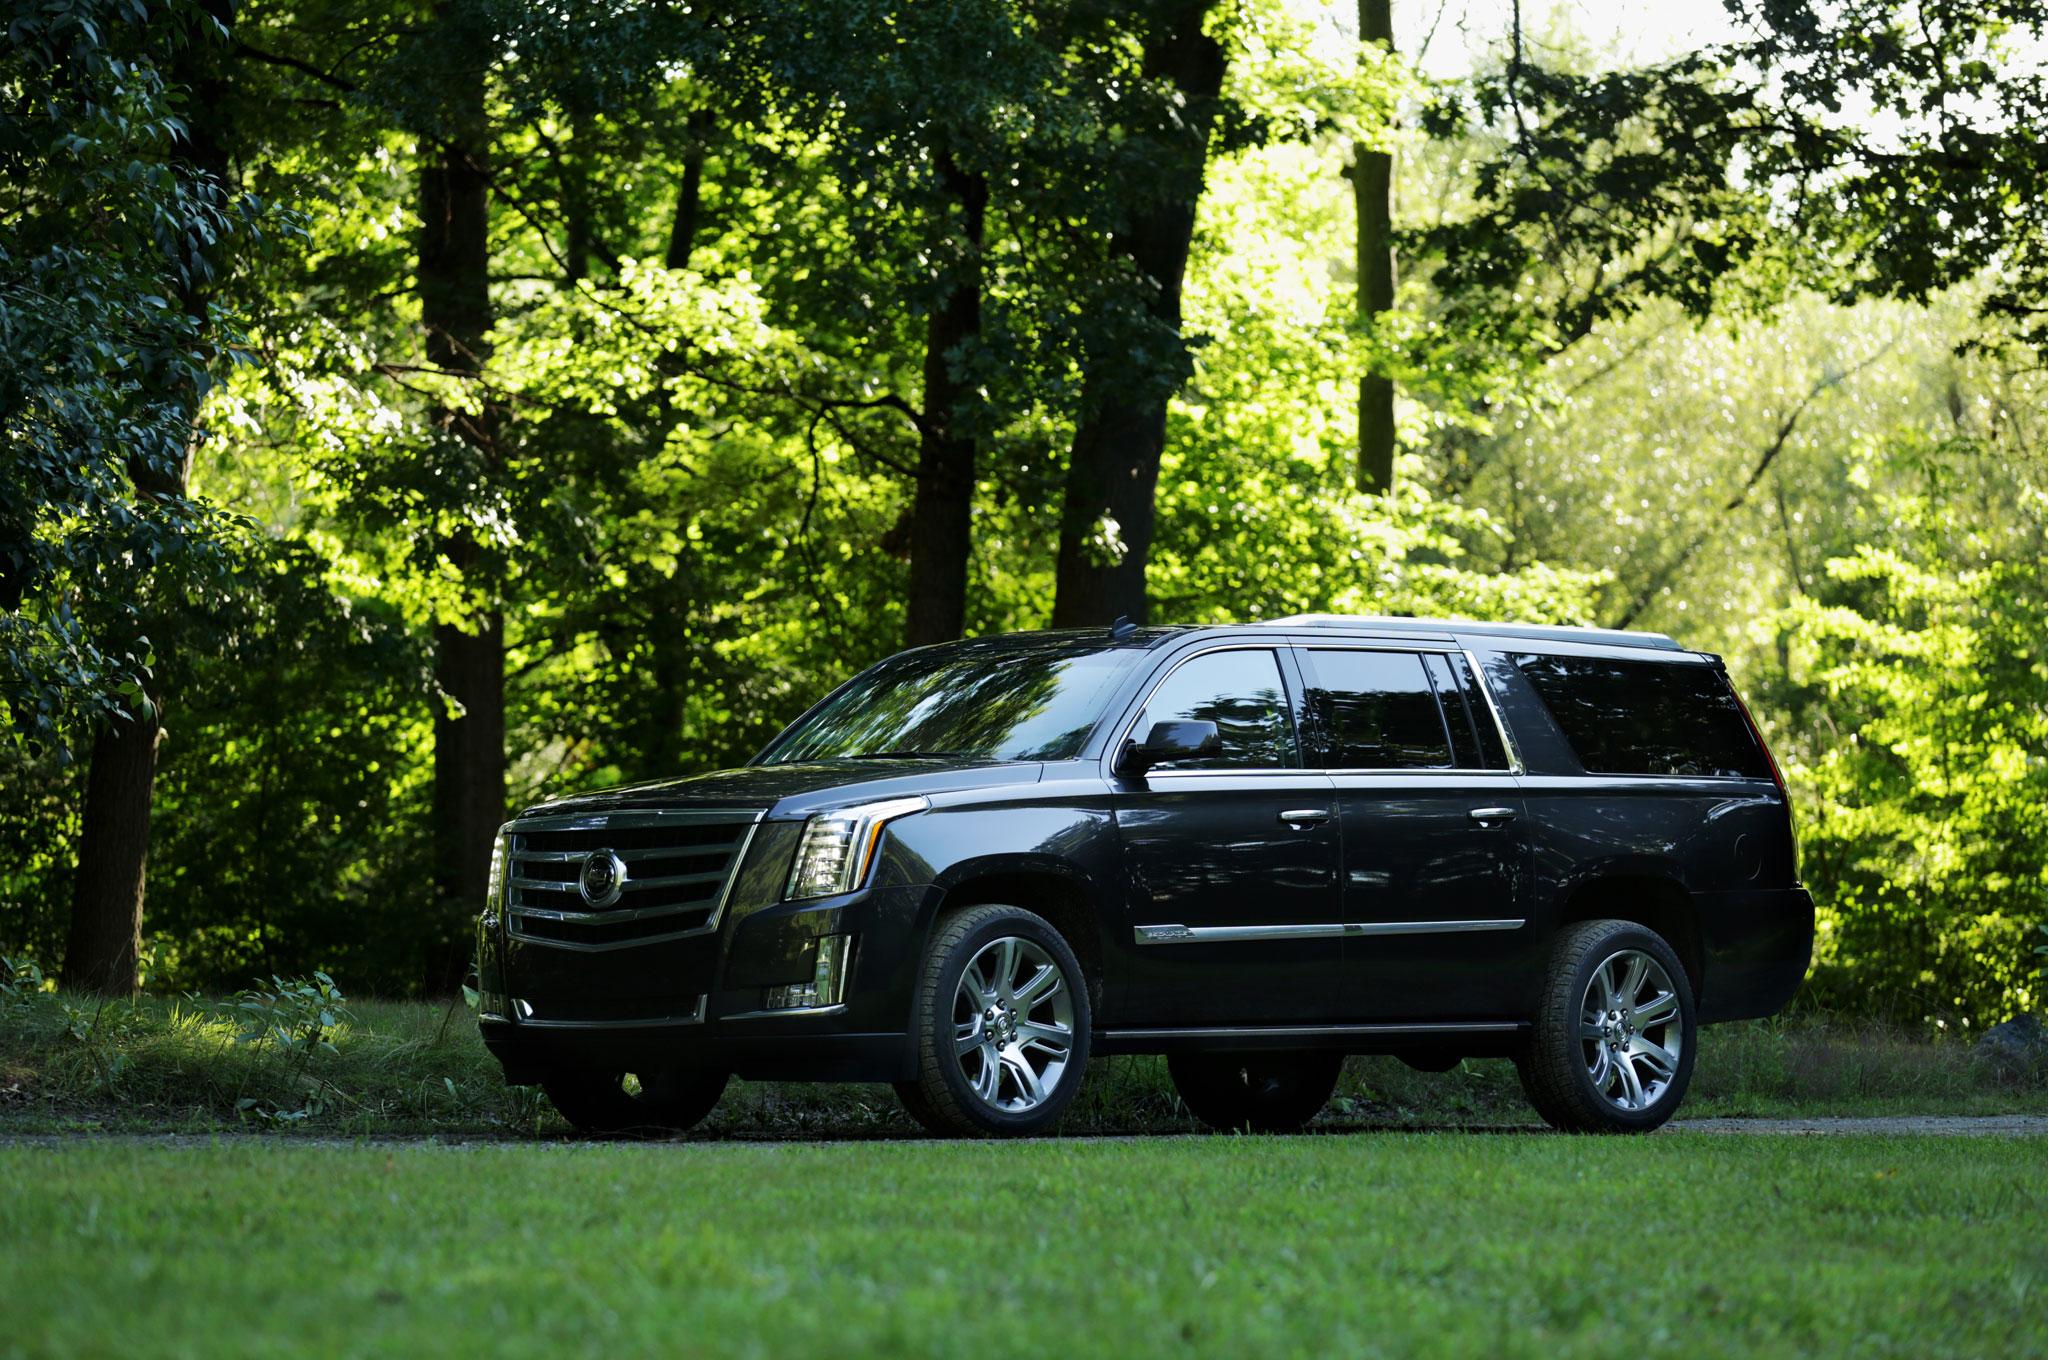 2015 Cadillac Escalade ESV: Around the Block